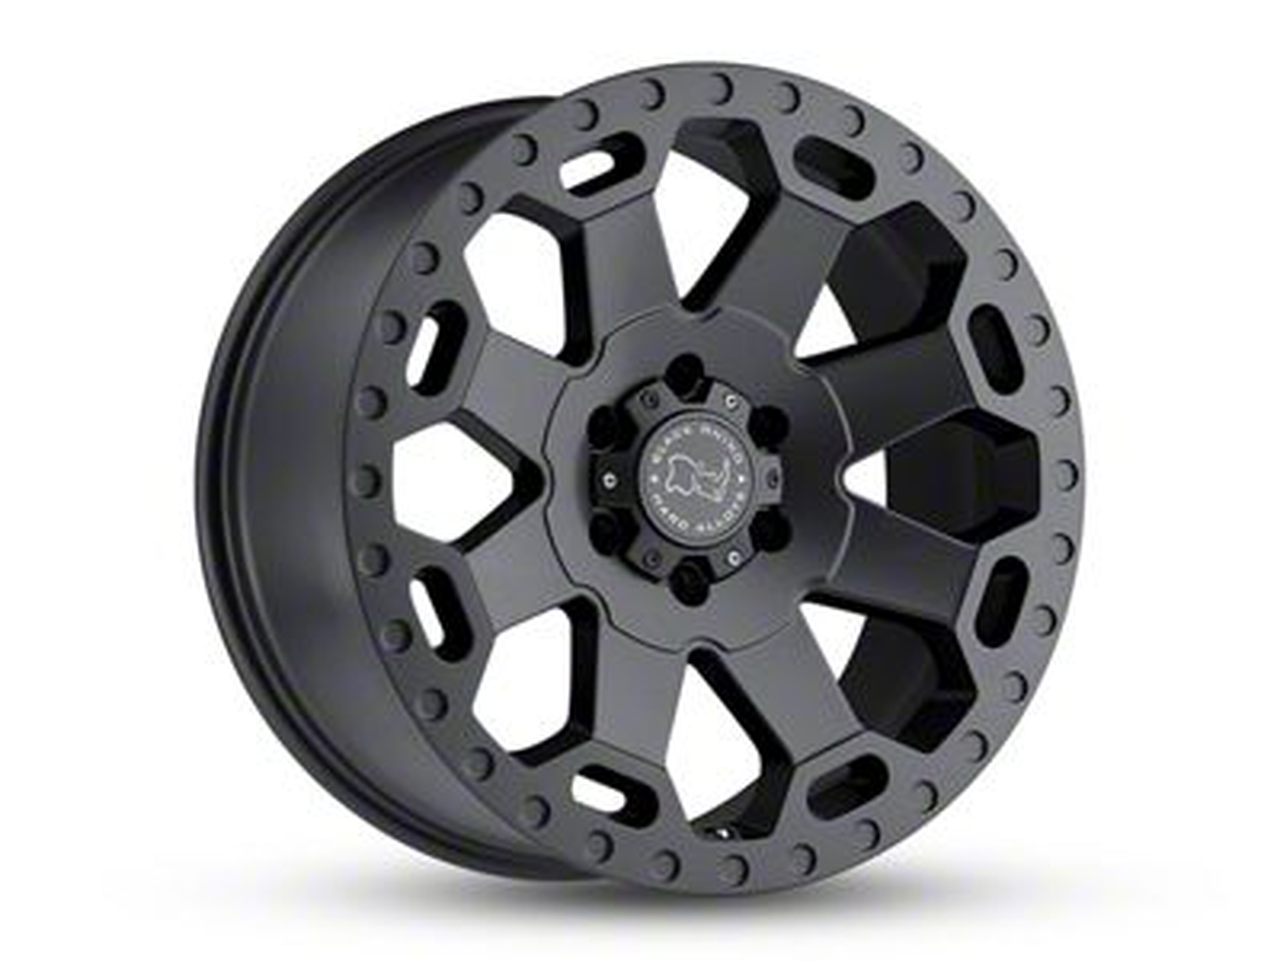 Black Rhino Warlord Matte Gunmetal 6-Lug Wheel - 17x9 (07-18 Sierra 1500)